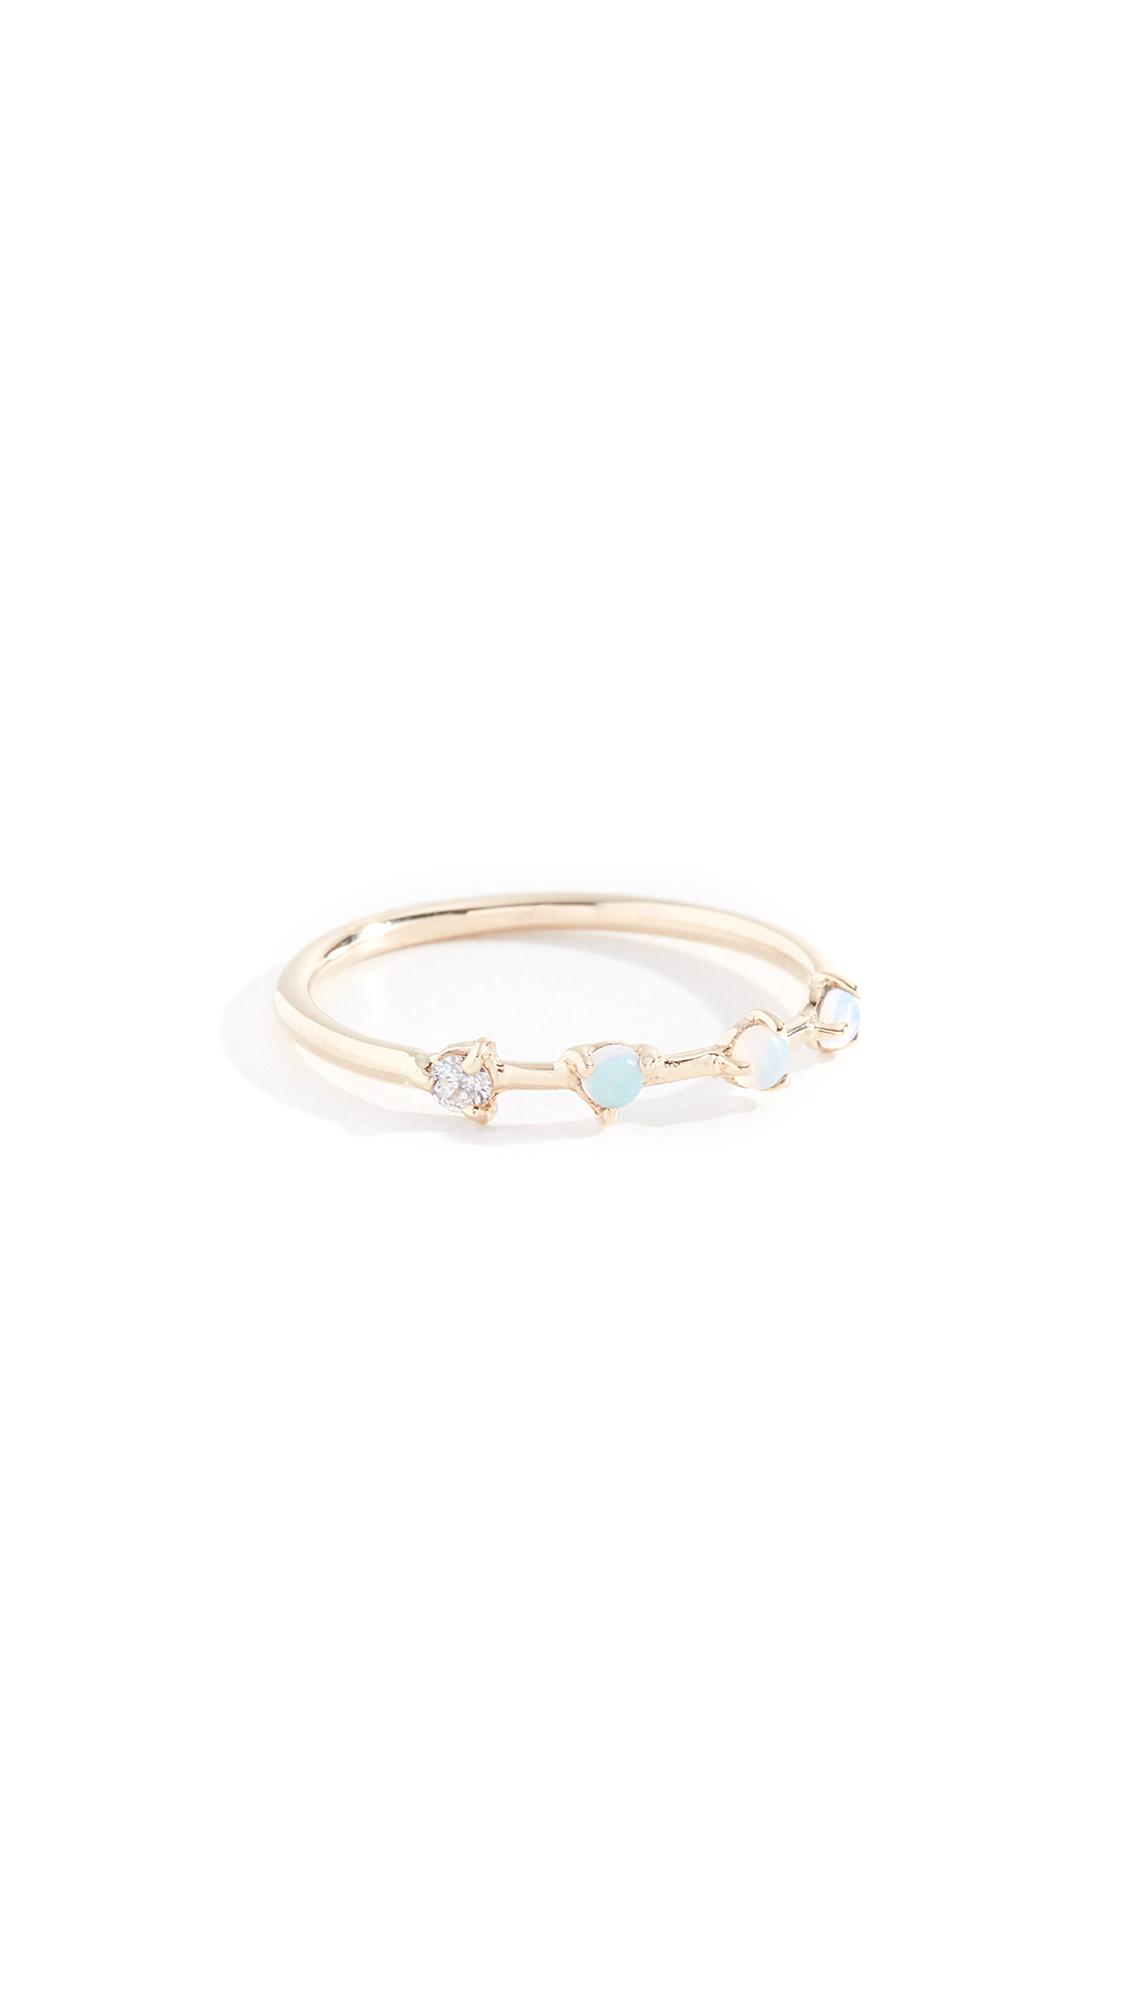 WWAKE 14K Four Step Ring in Diamond/Opal